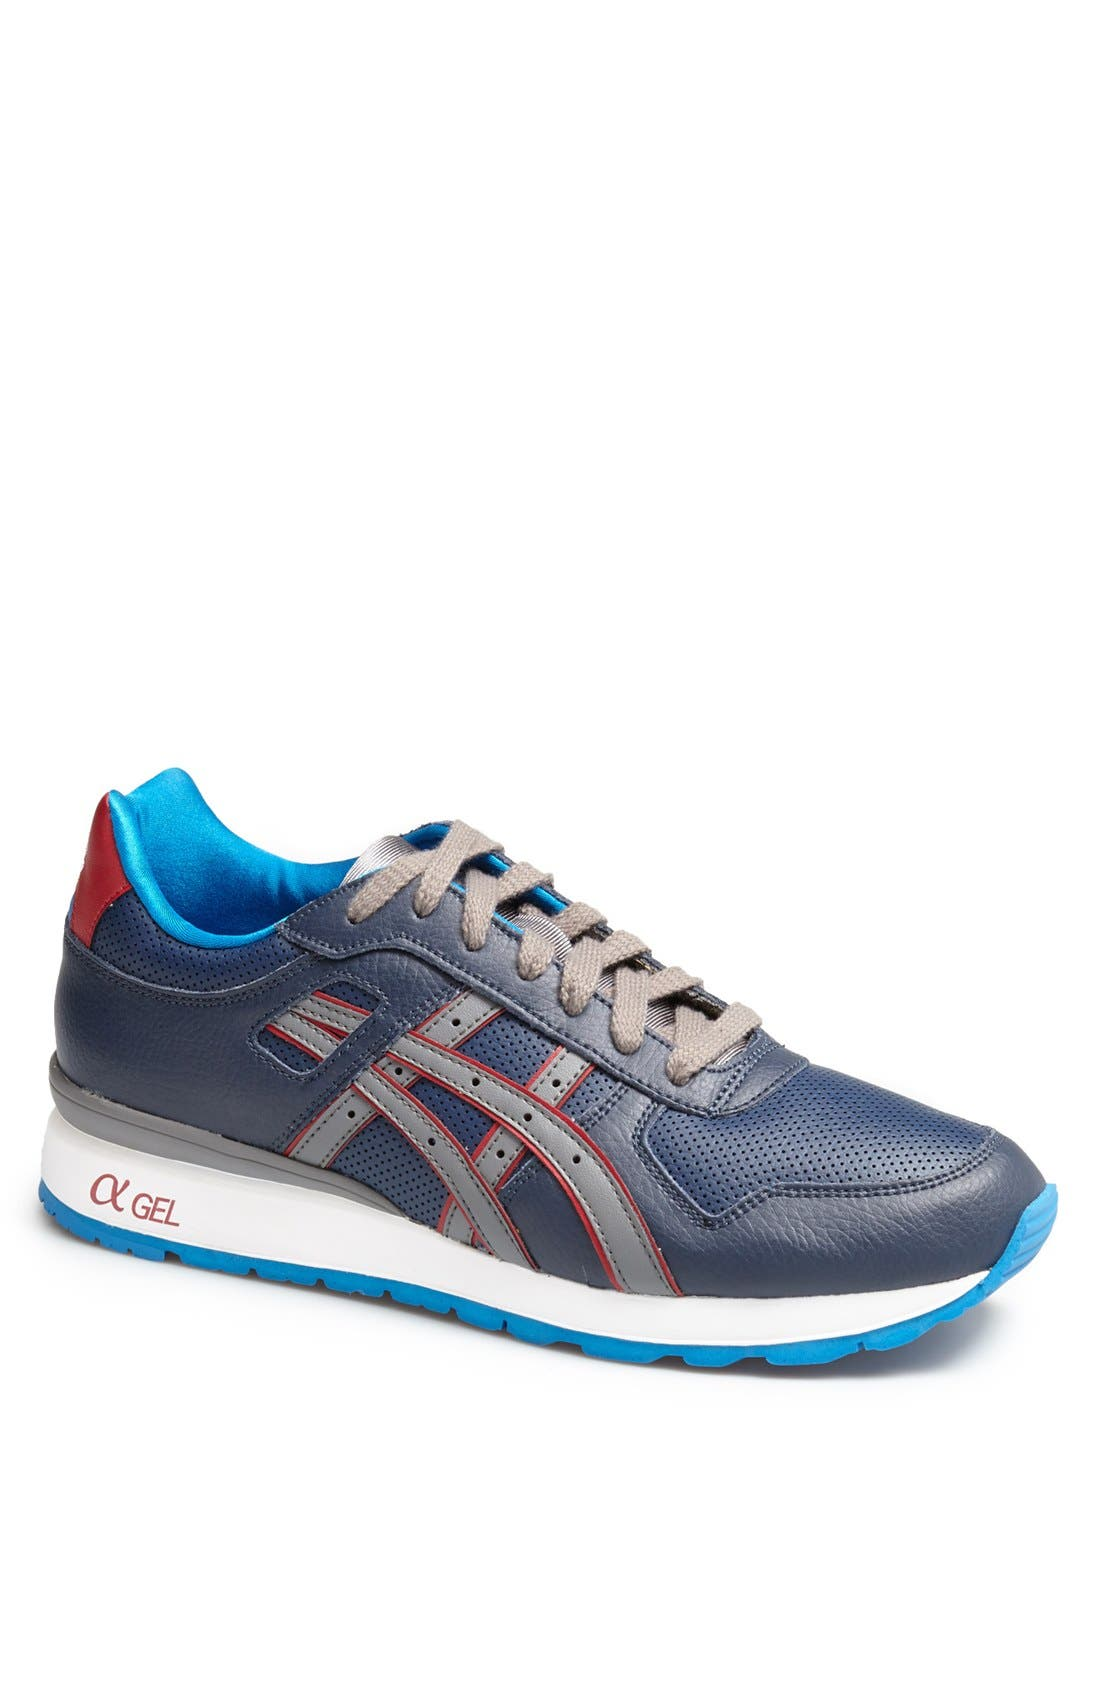 Main Image - ASICS® 'GT-II™' Sneaker (Men)